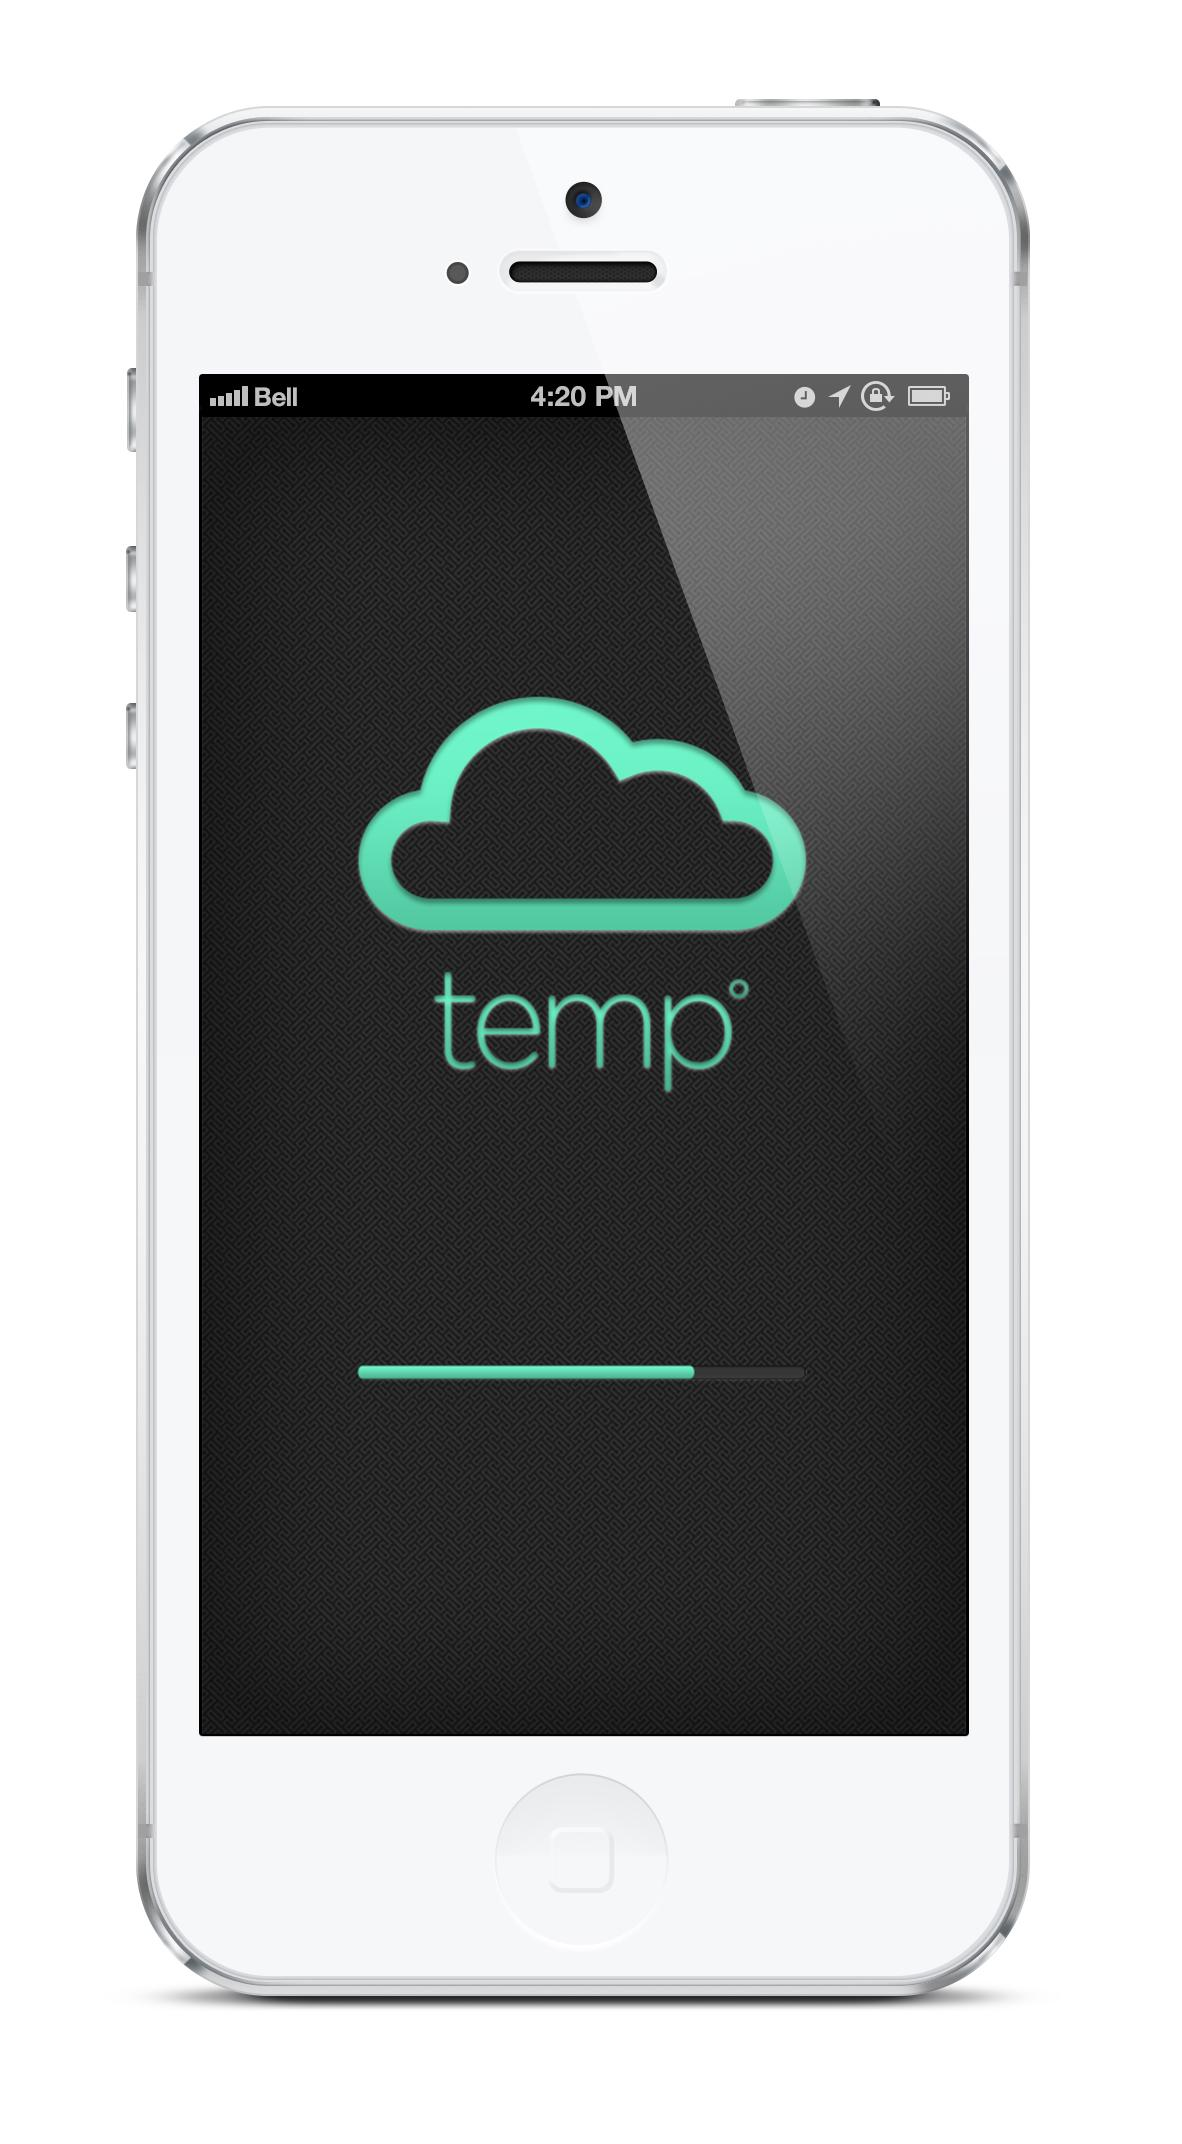 Tempº App - image 1 - student project